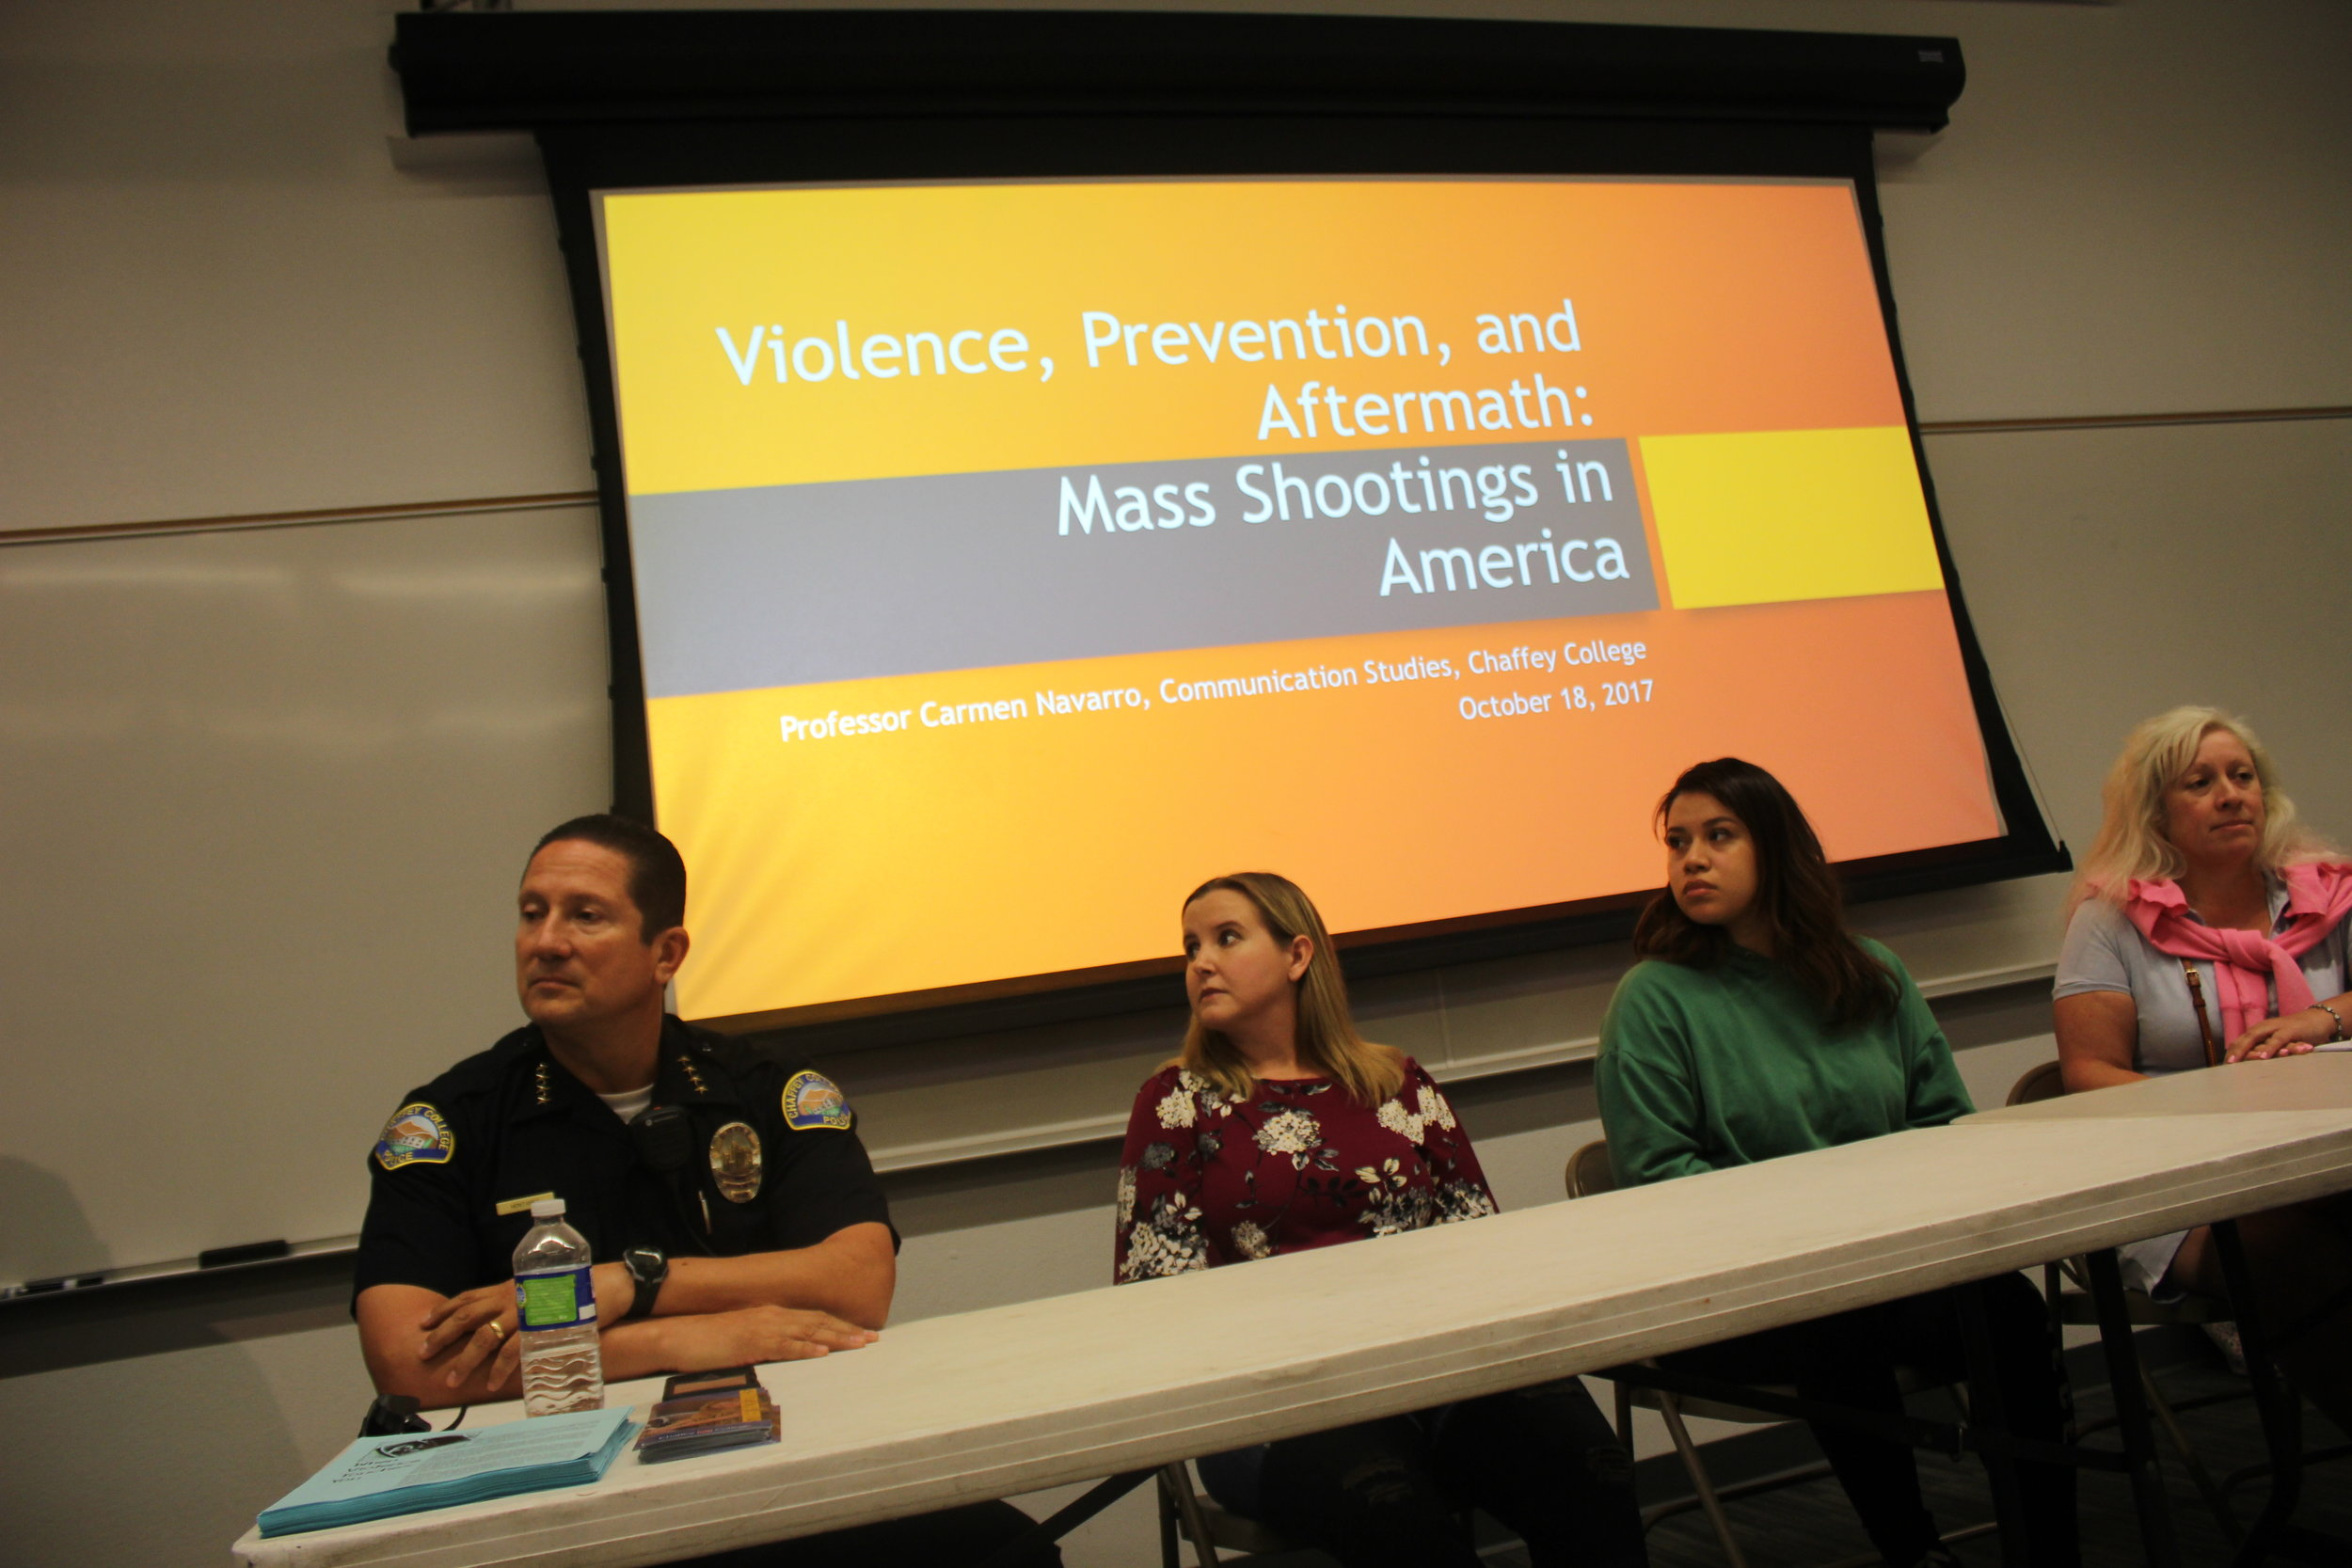 Chaffey College Chief of Police Frank Martinez, Sally Cardinale, Jessica Martinez and Professor Carmen Navarro speaking at the forum. Photo/Hector Solozano